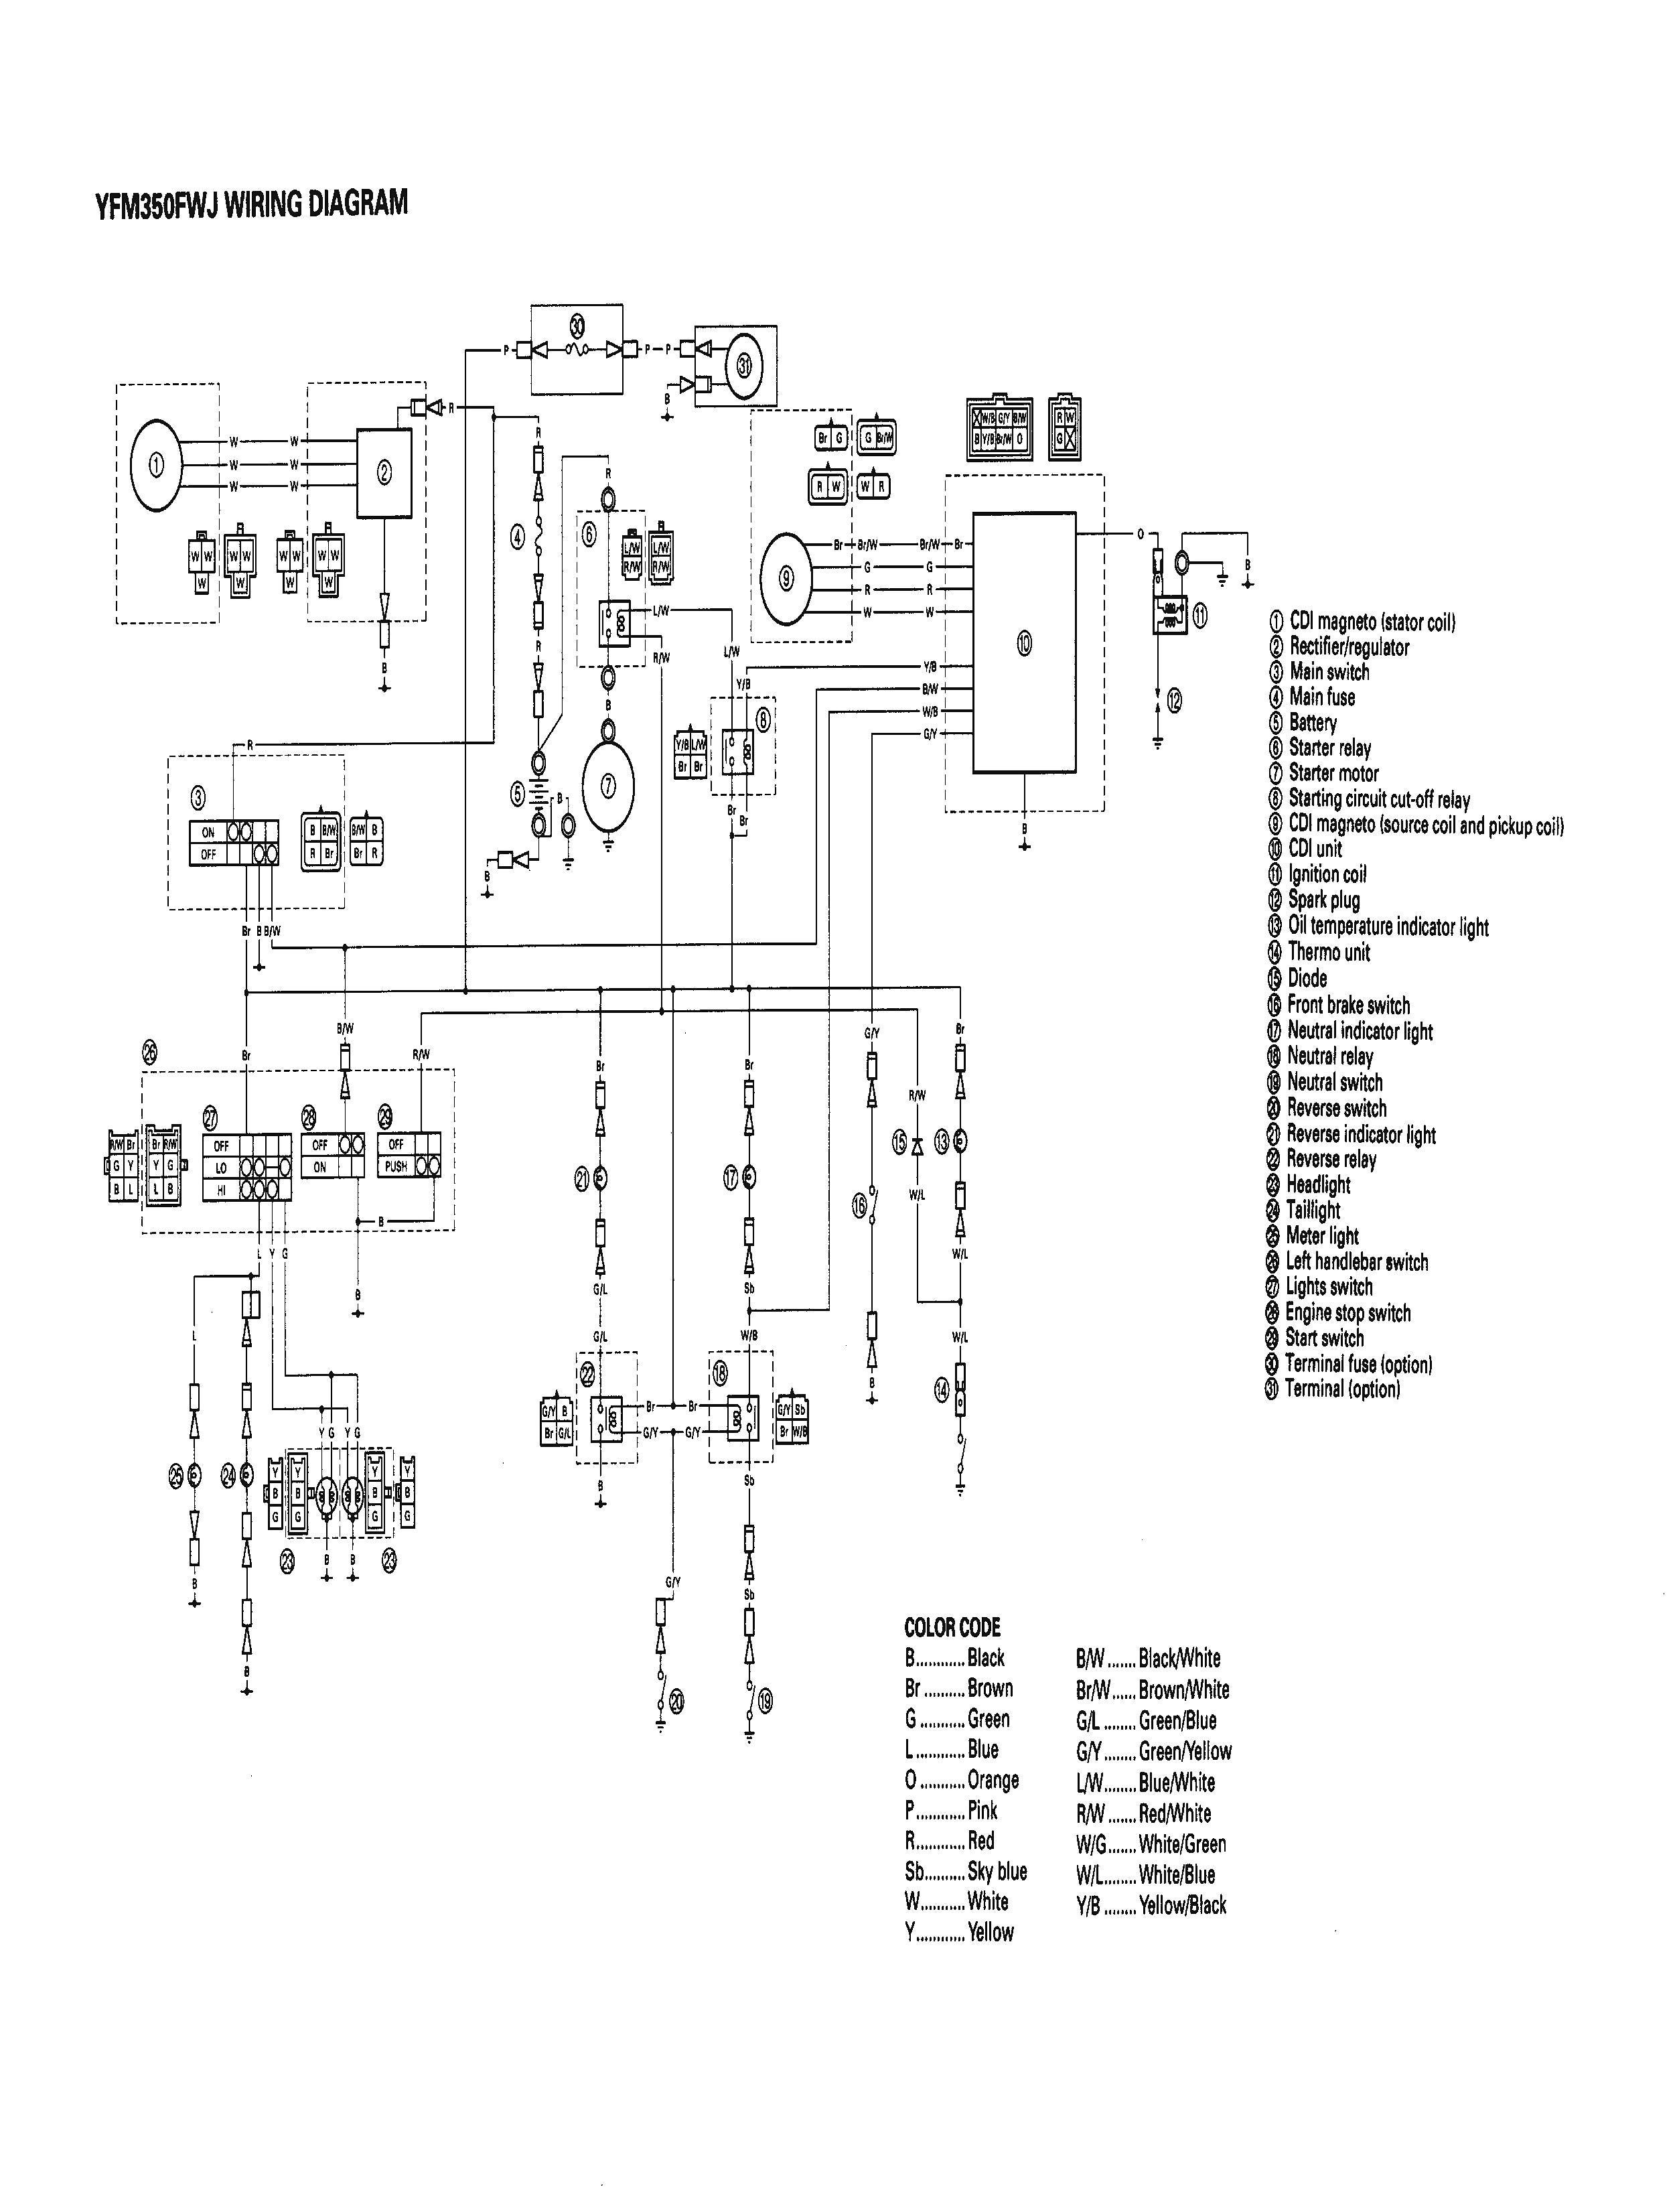 ultra remote car starter wiring diagram 2003 honda civic alarm yamaha grizzly 660 engine my